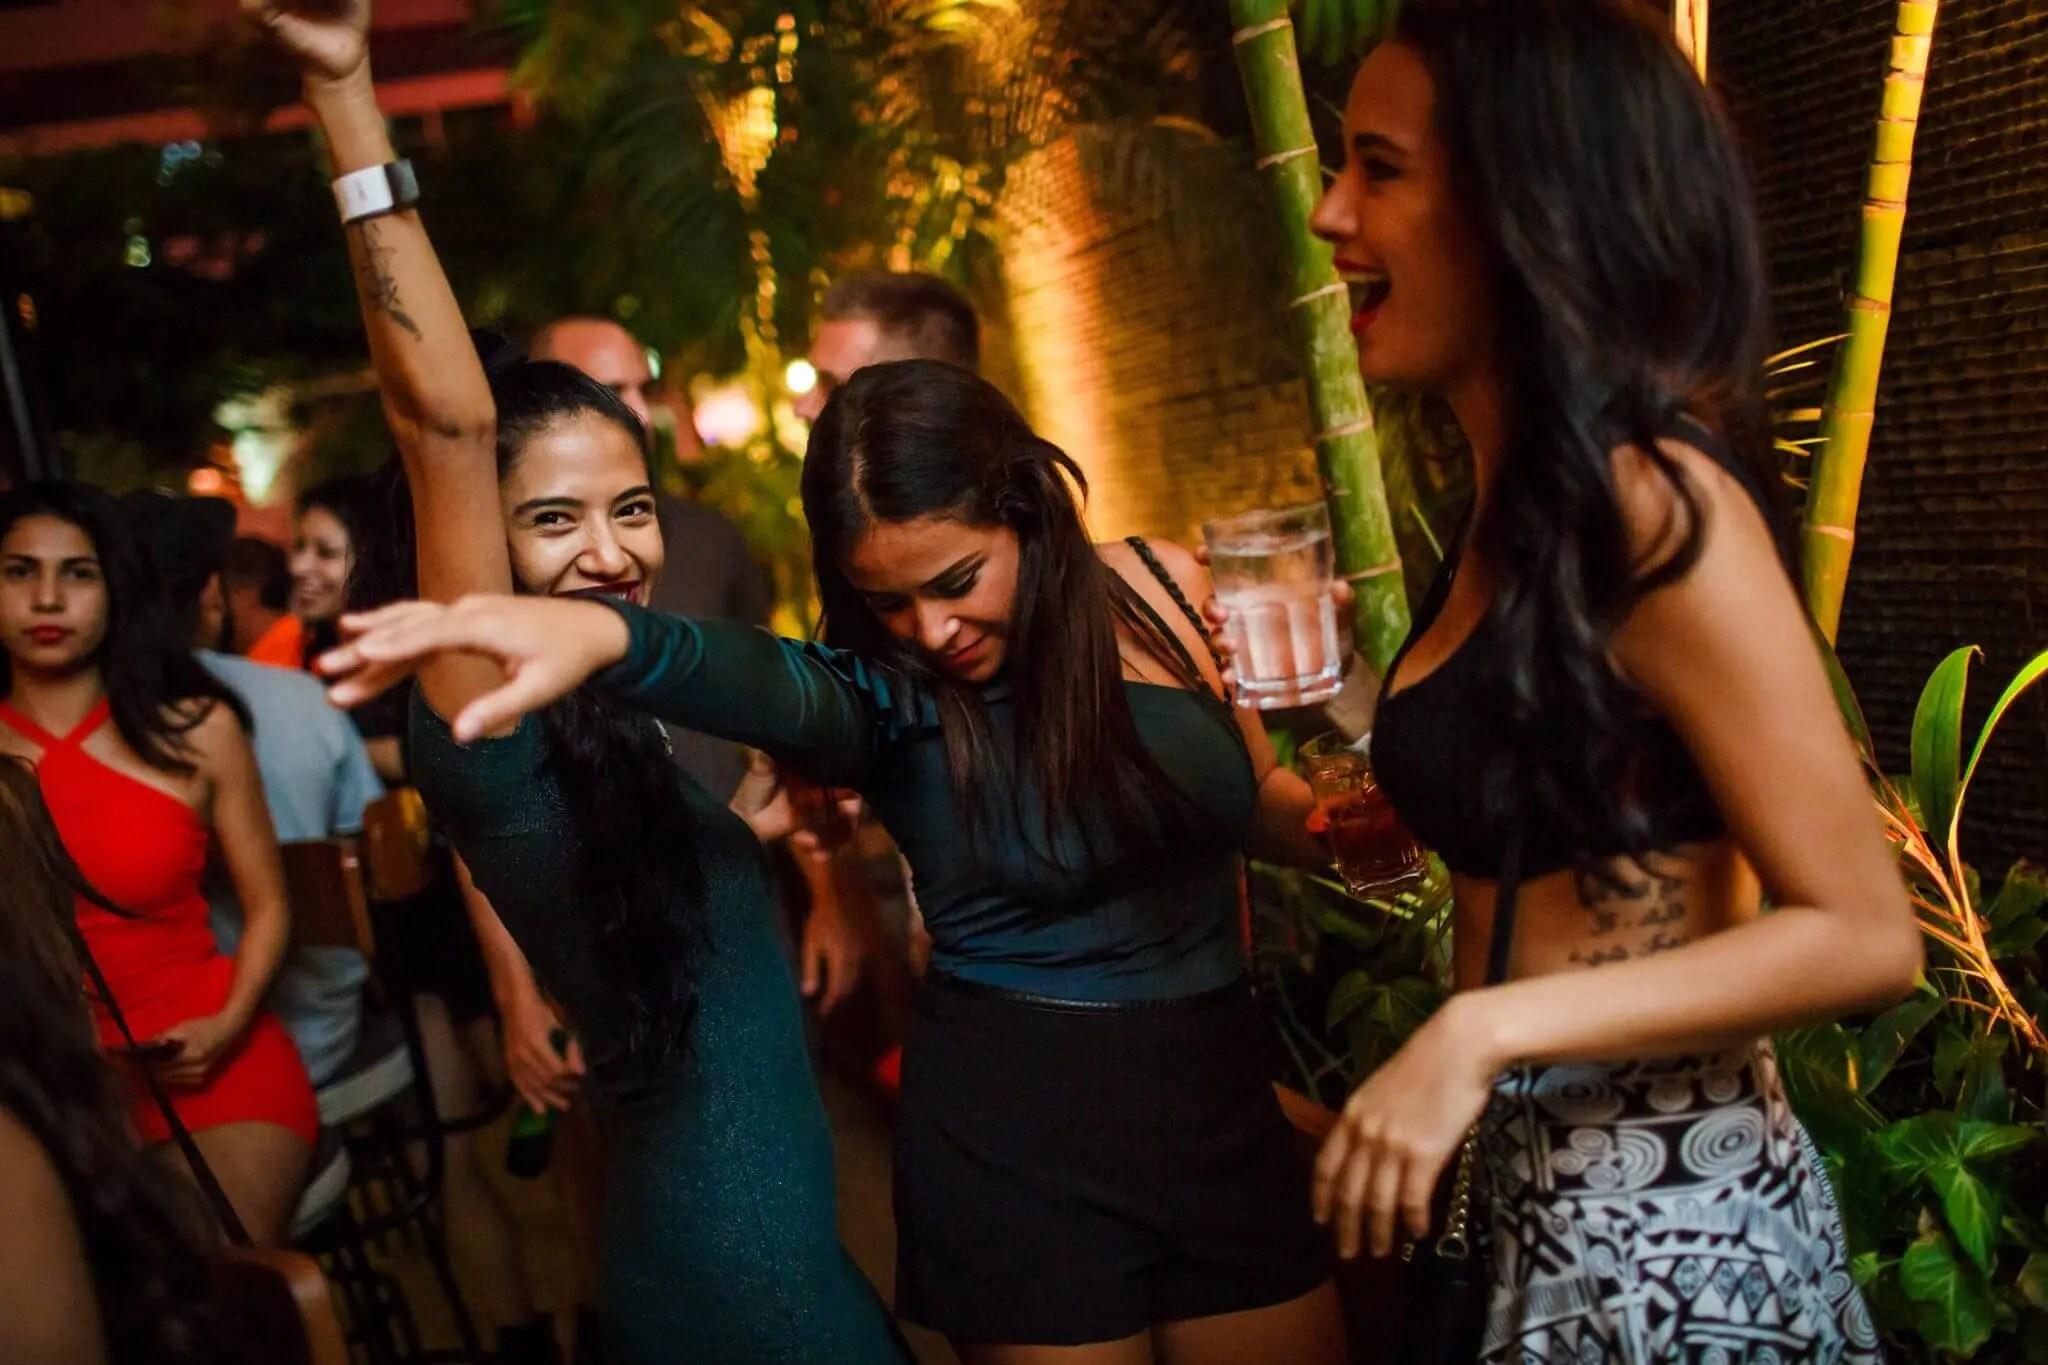 Ladies Night: Drink For FREE Every Night in Playa del Carmen